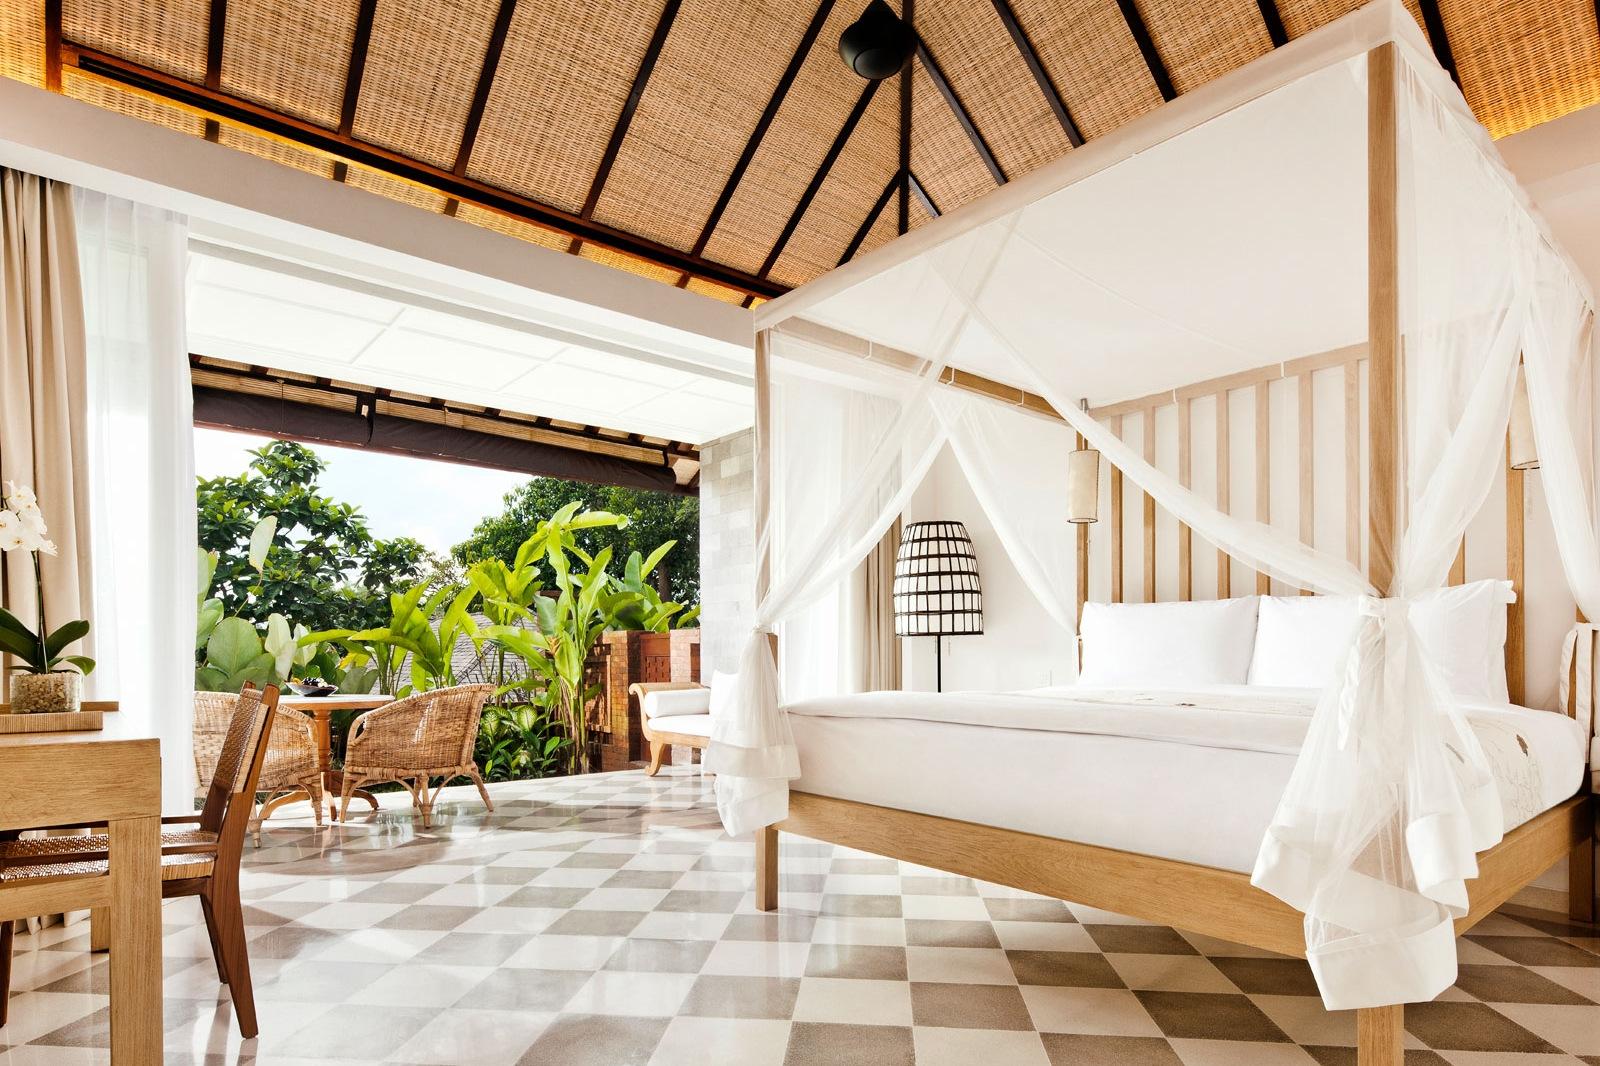 Perfect Bali Home Design Frieze - Home Decorating Inspiration ...